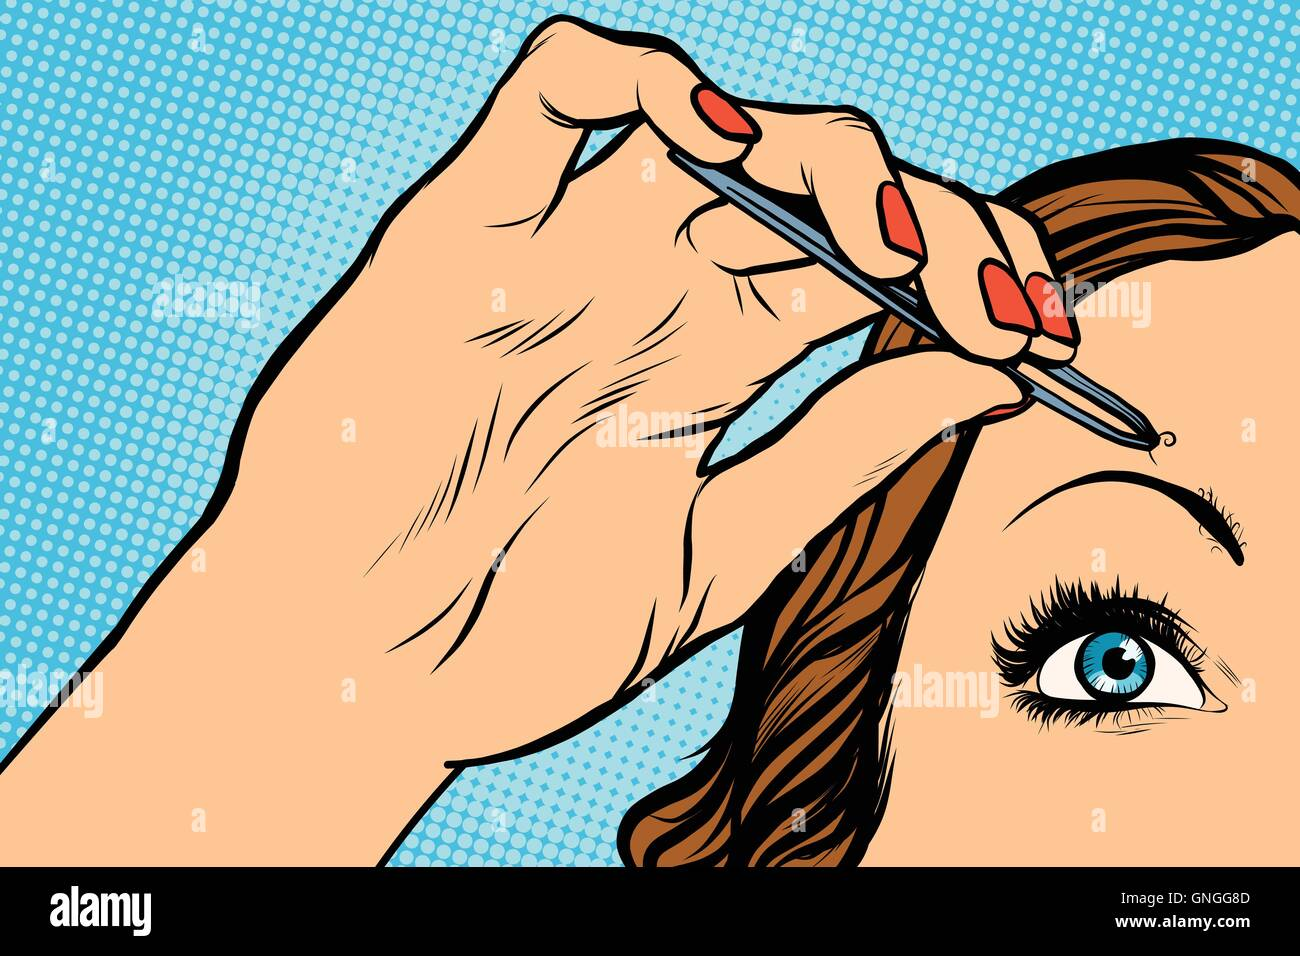 woman plucking eyebrows depilating with tweezers - Stock Image